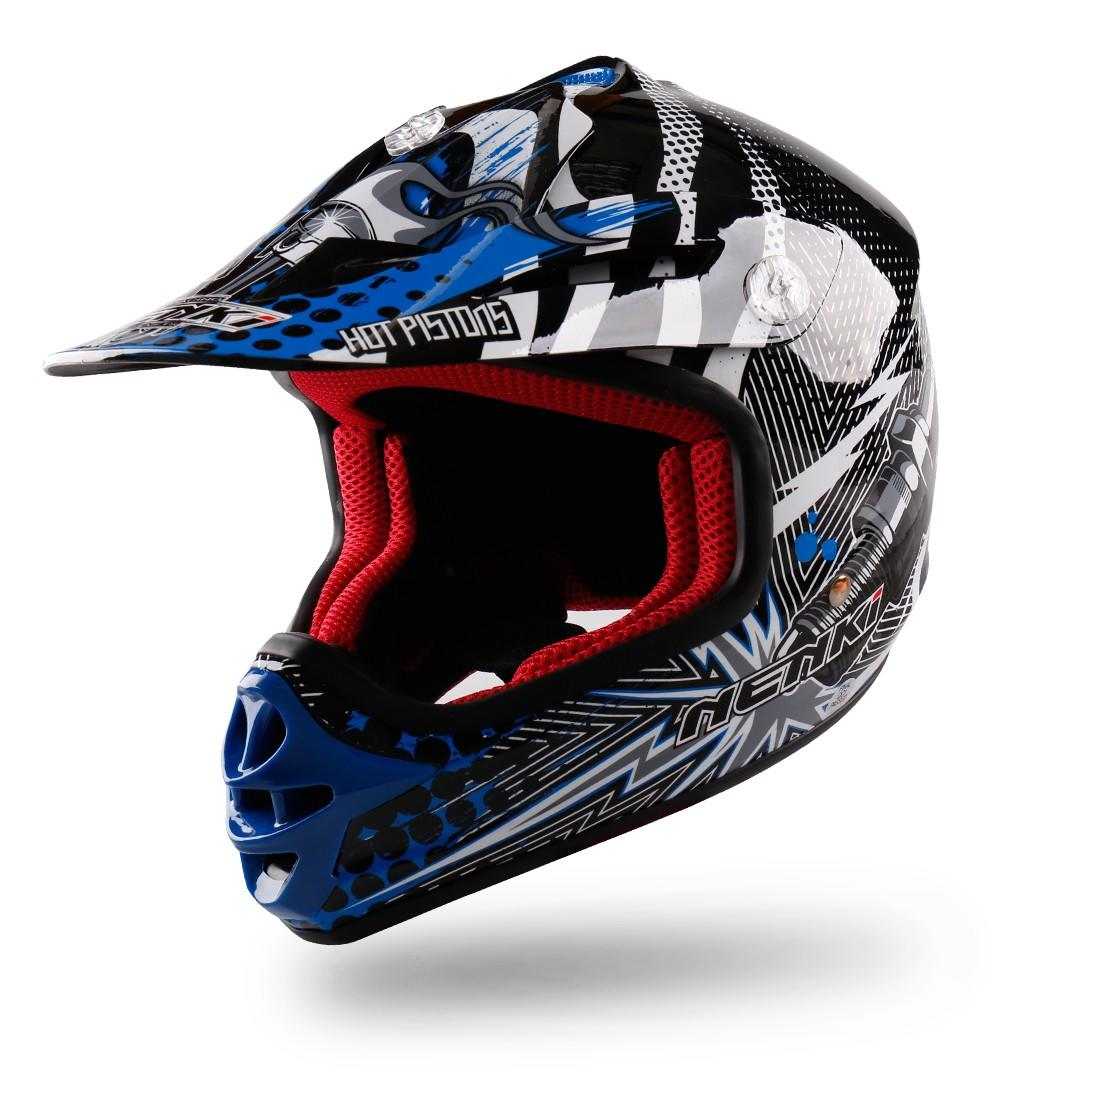 Nenki cool motocross helmets suppliers for motorcycle-1